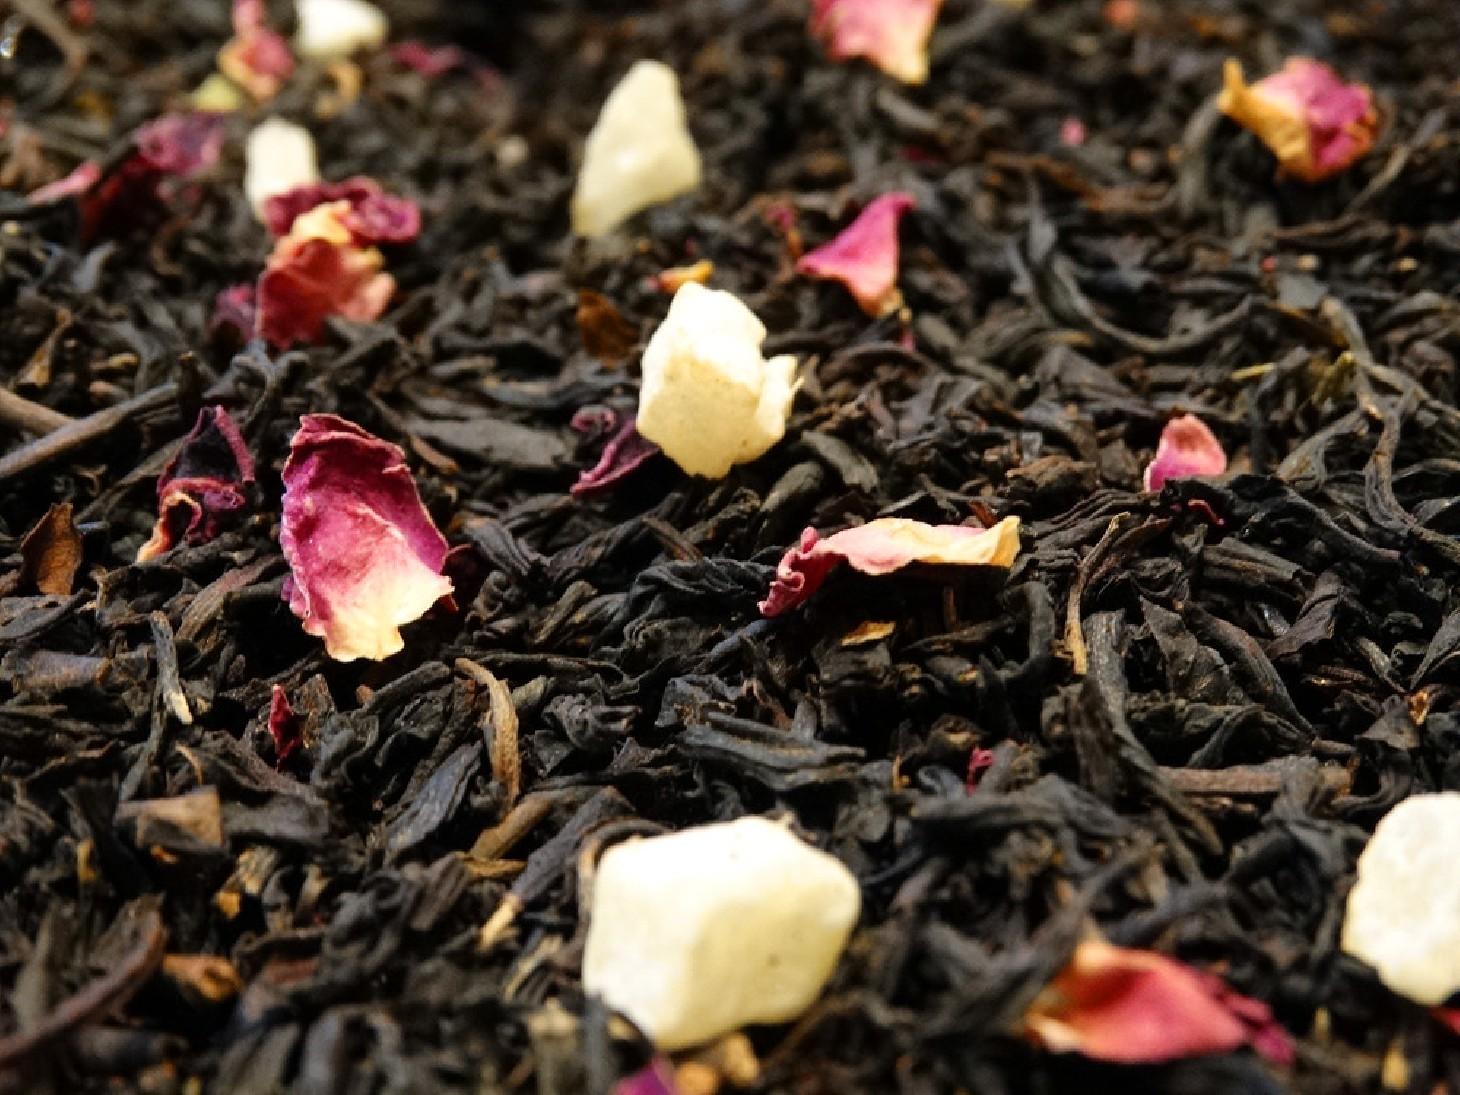 Flavoured black tea, vine peach, rose petals